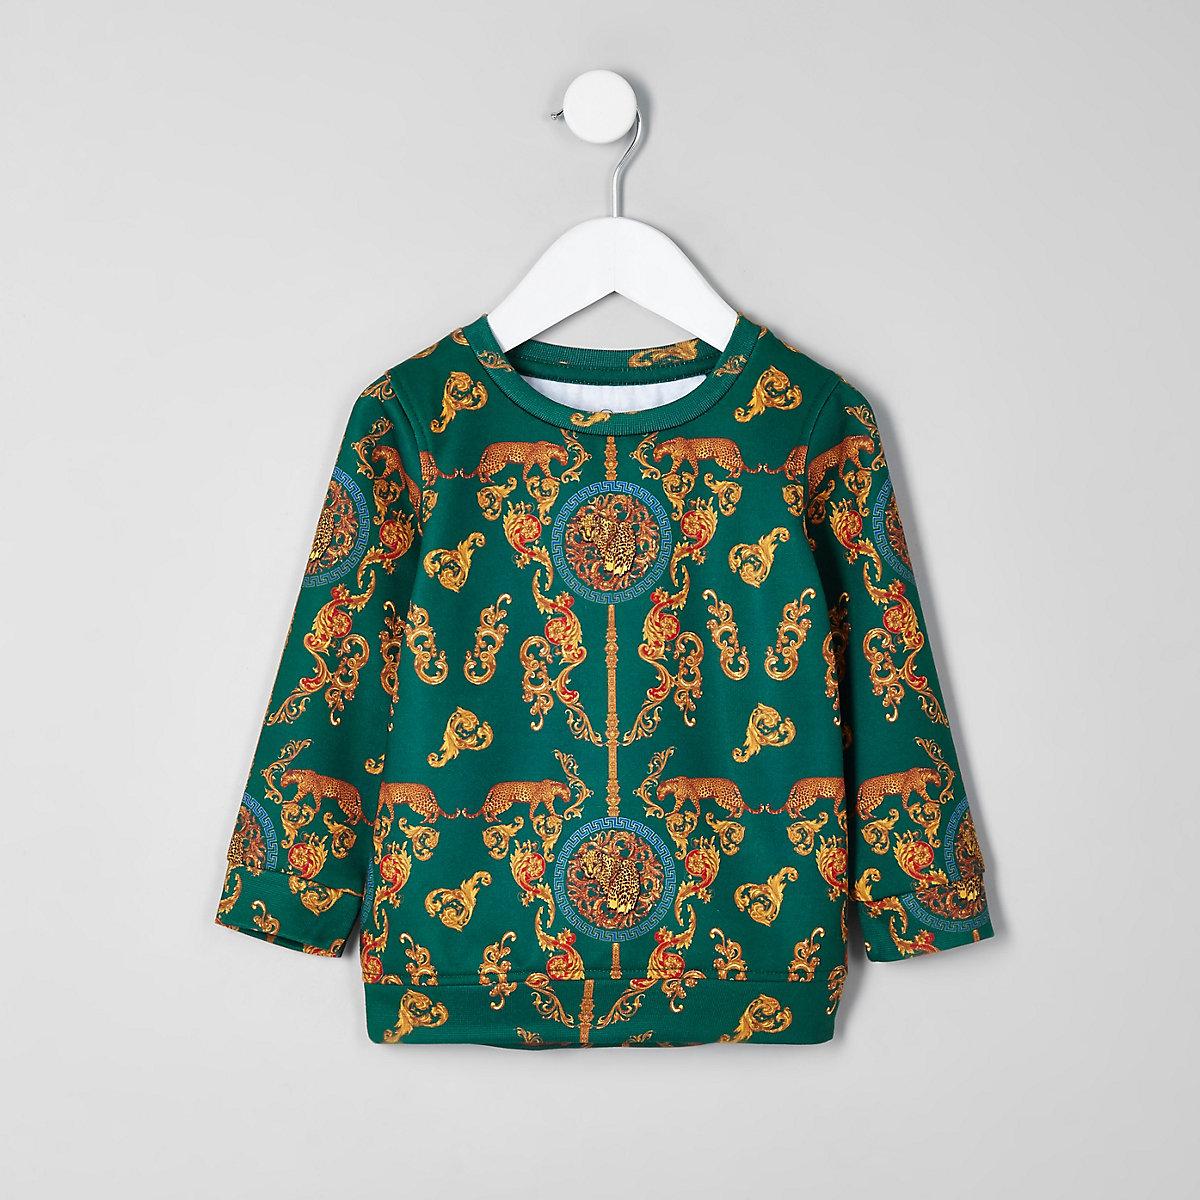 Mini boys green baroque sweatshirt